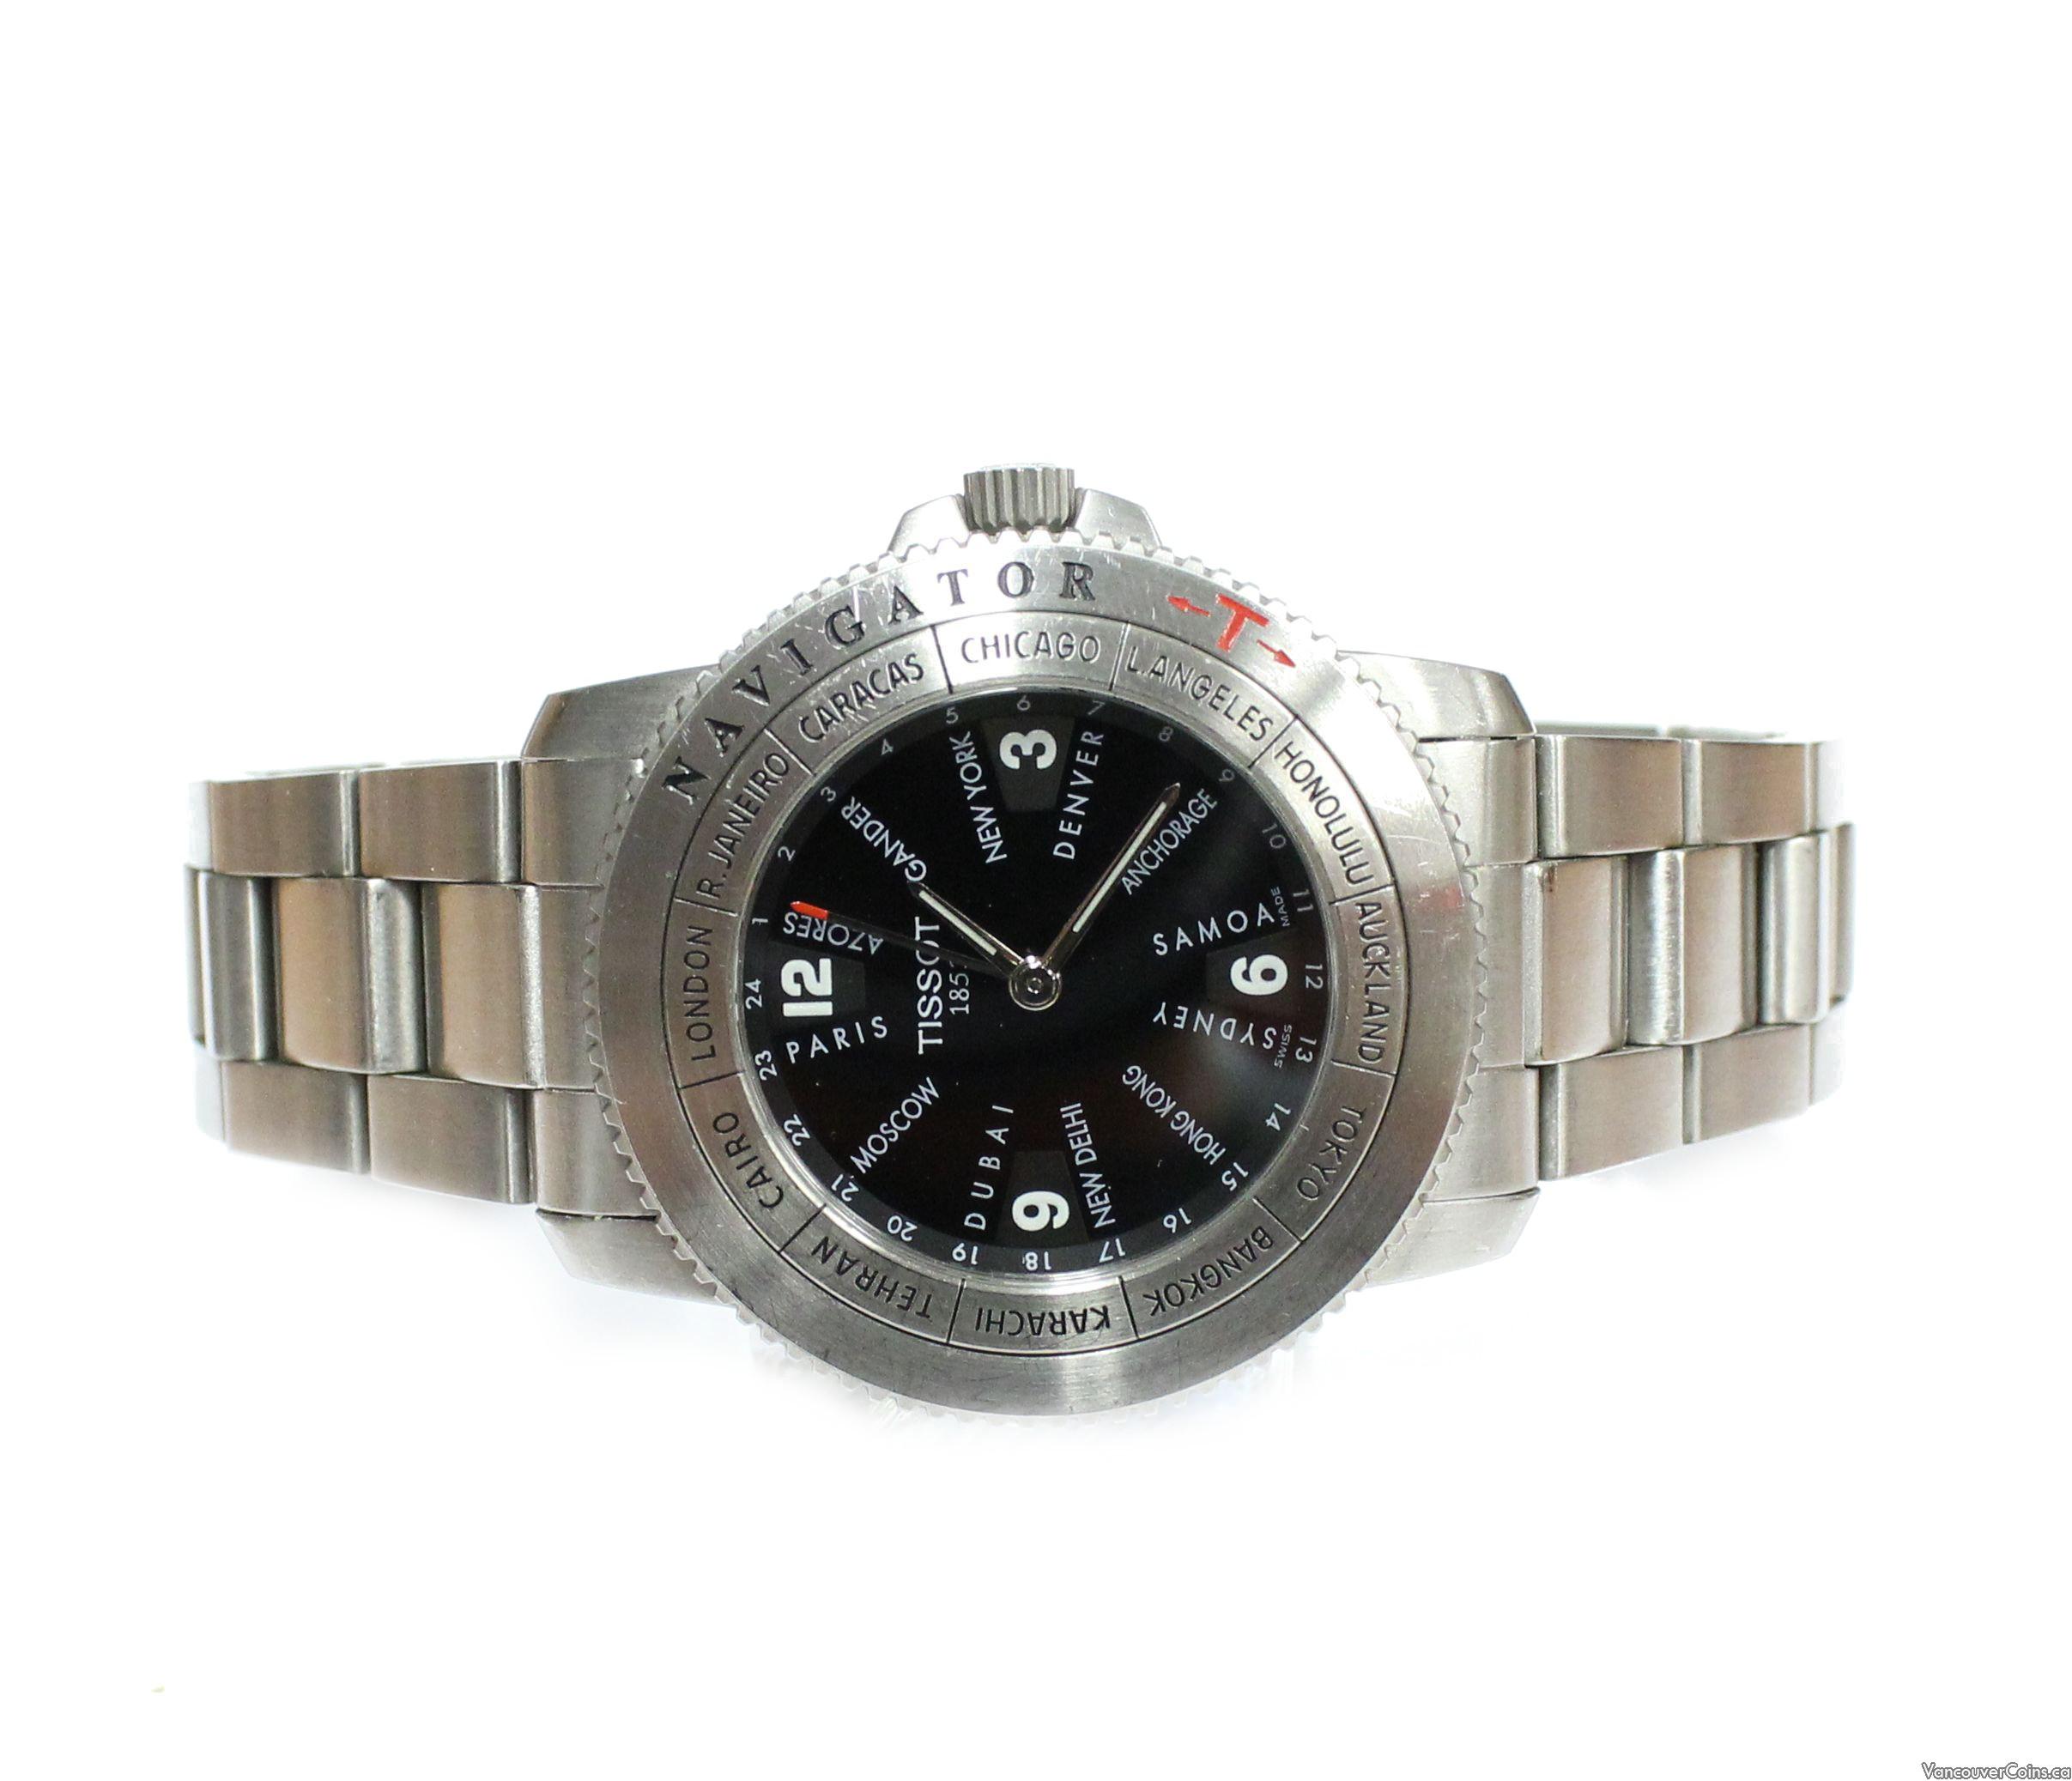 TISSOT GMT Navigator -T- World Time SS black dial watch